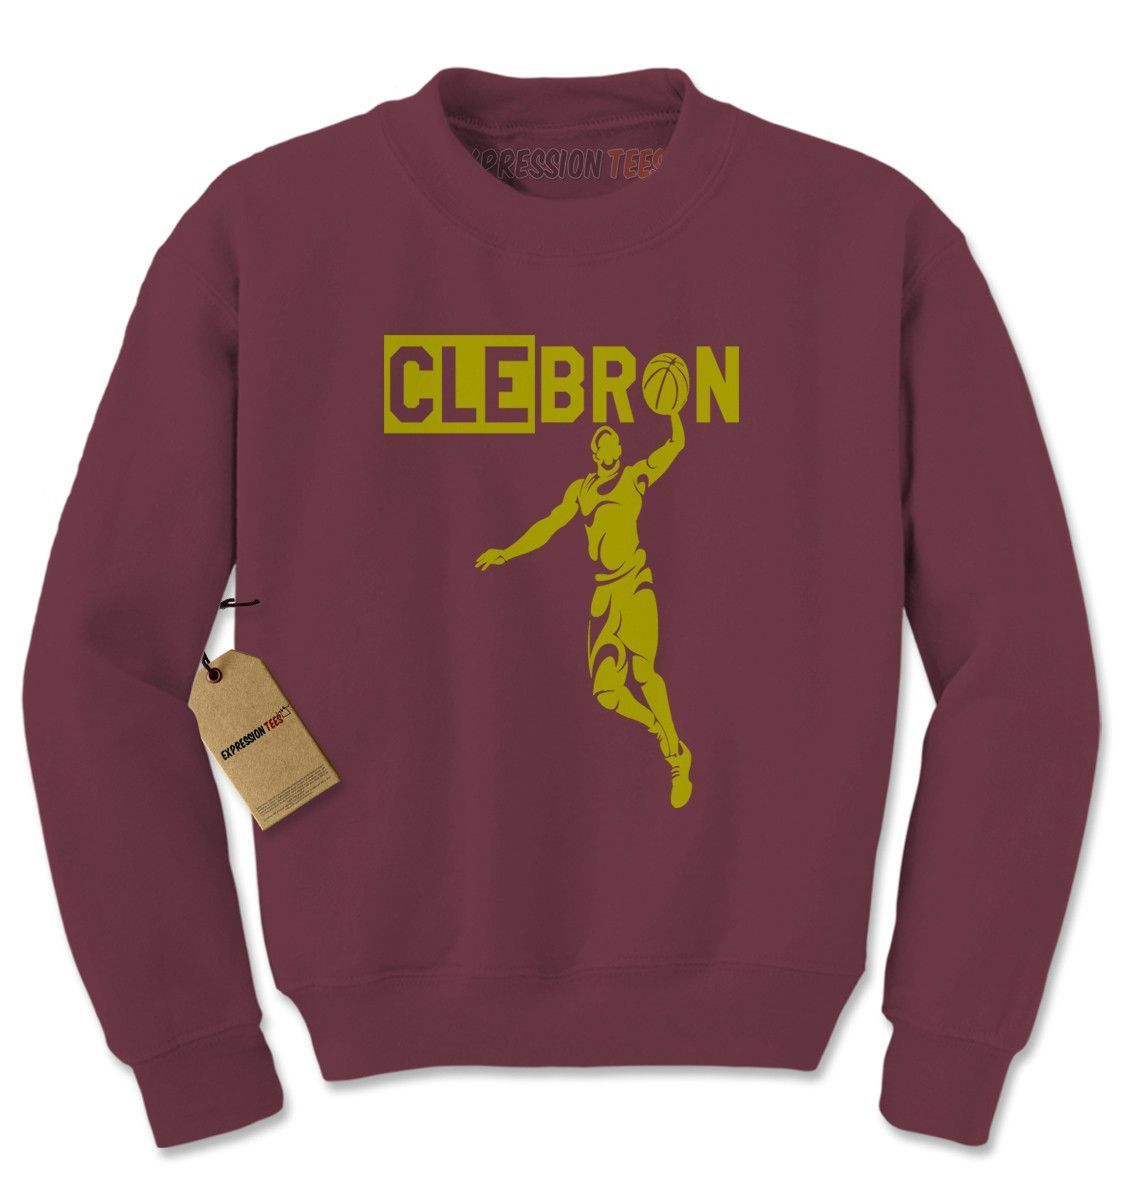 CLEbron Clebron 2016 Cleveland Basketball Champions Adult Crewneck Sweatshirt